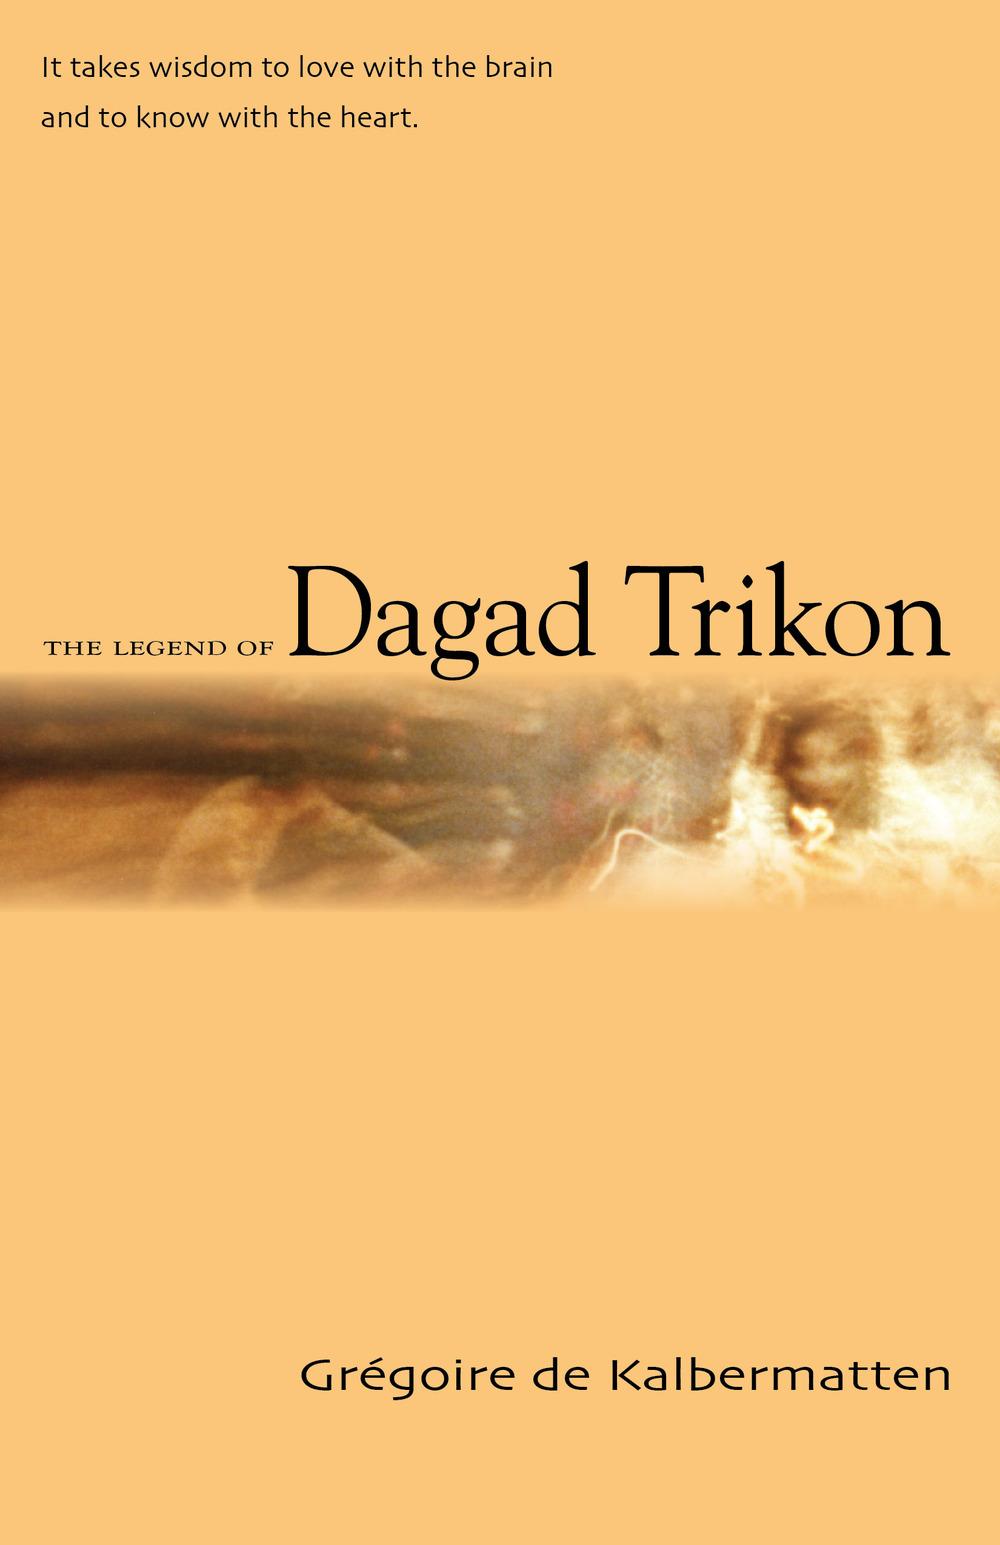 THE LEGEND OFDAGAD TRIKON